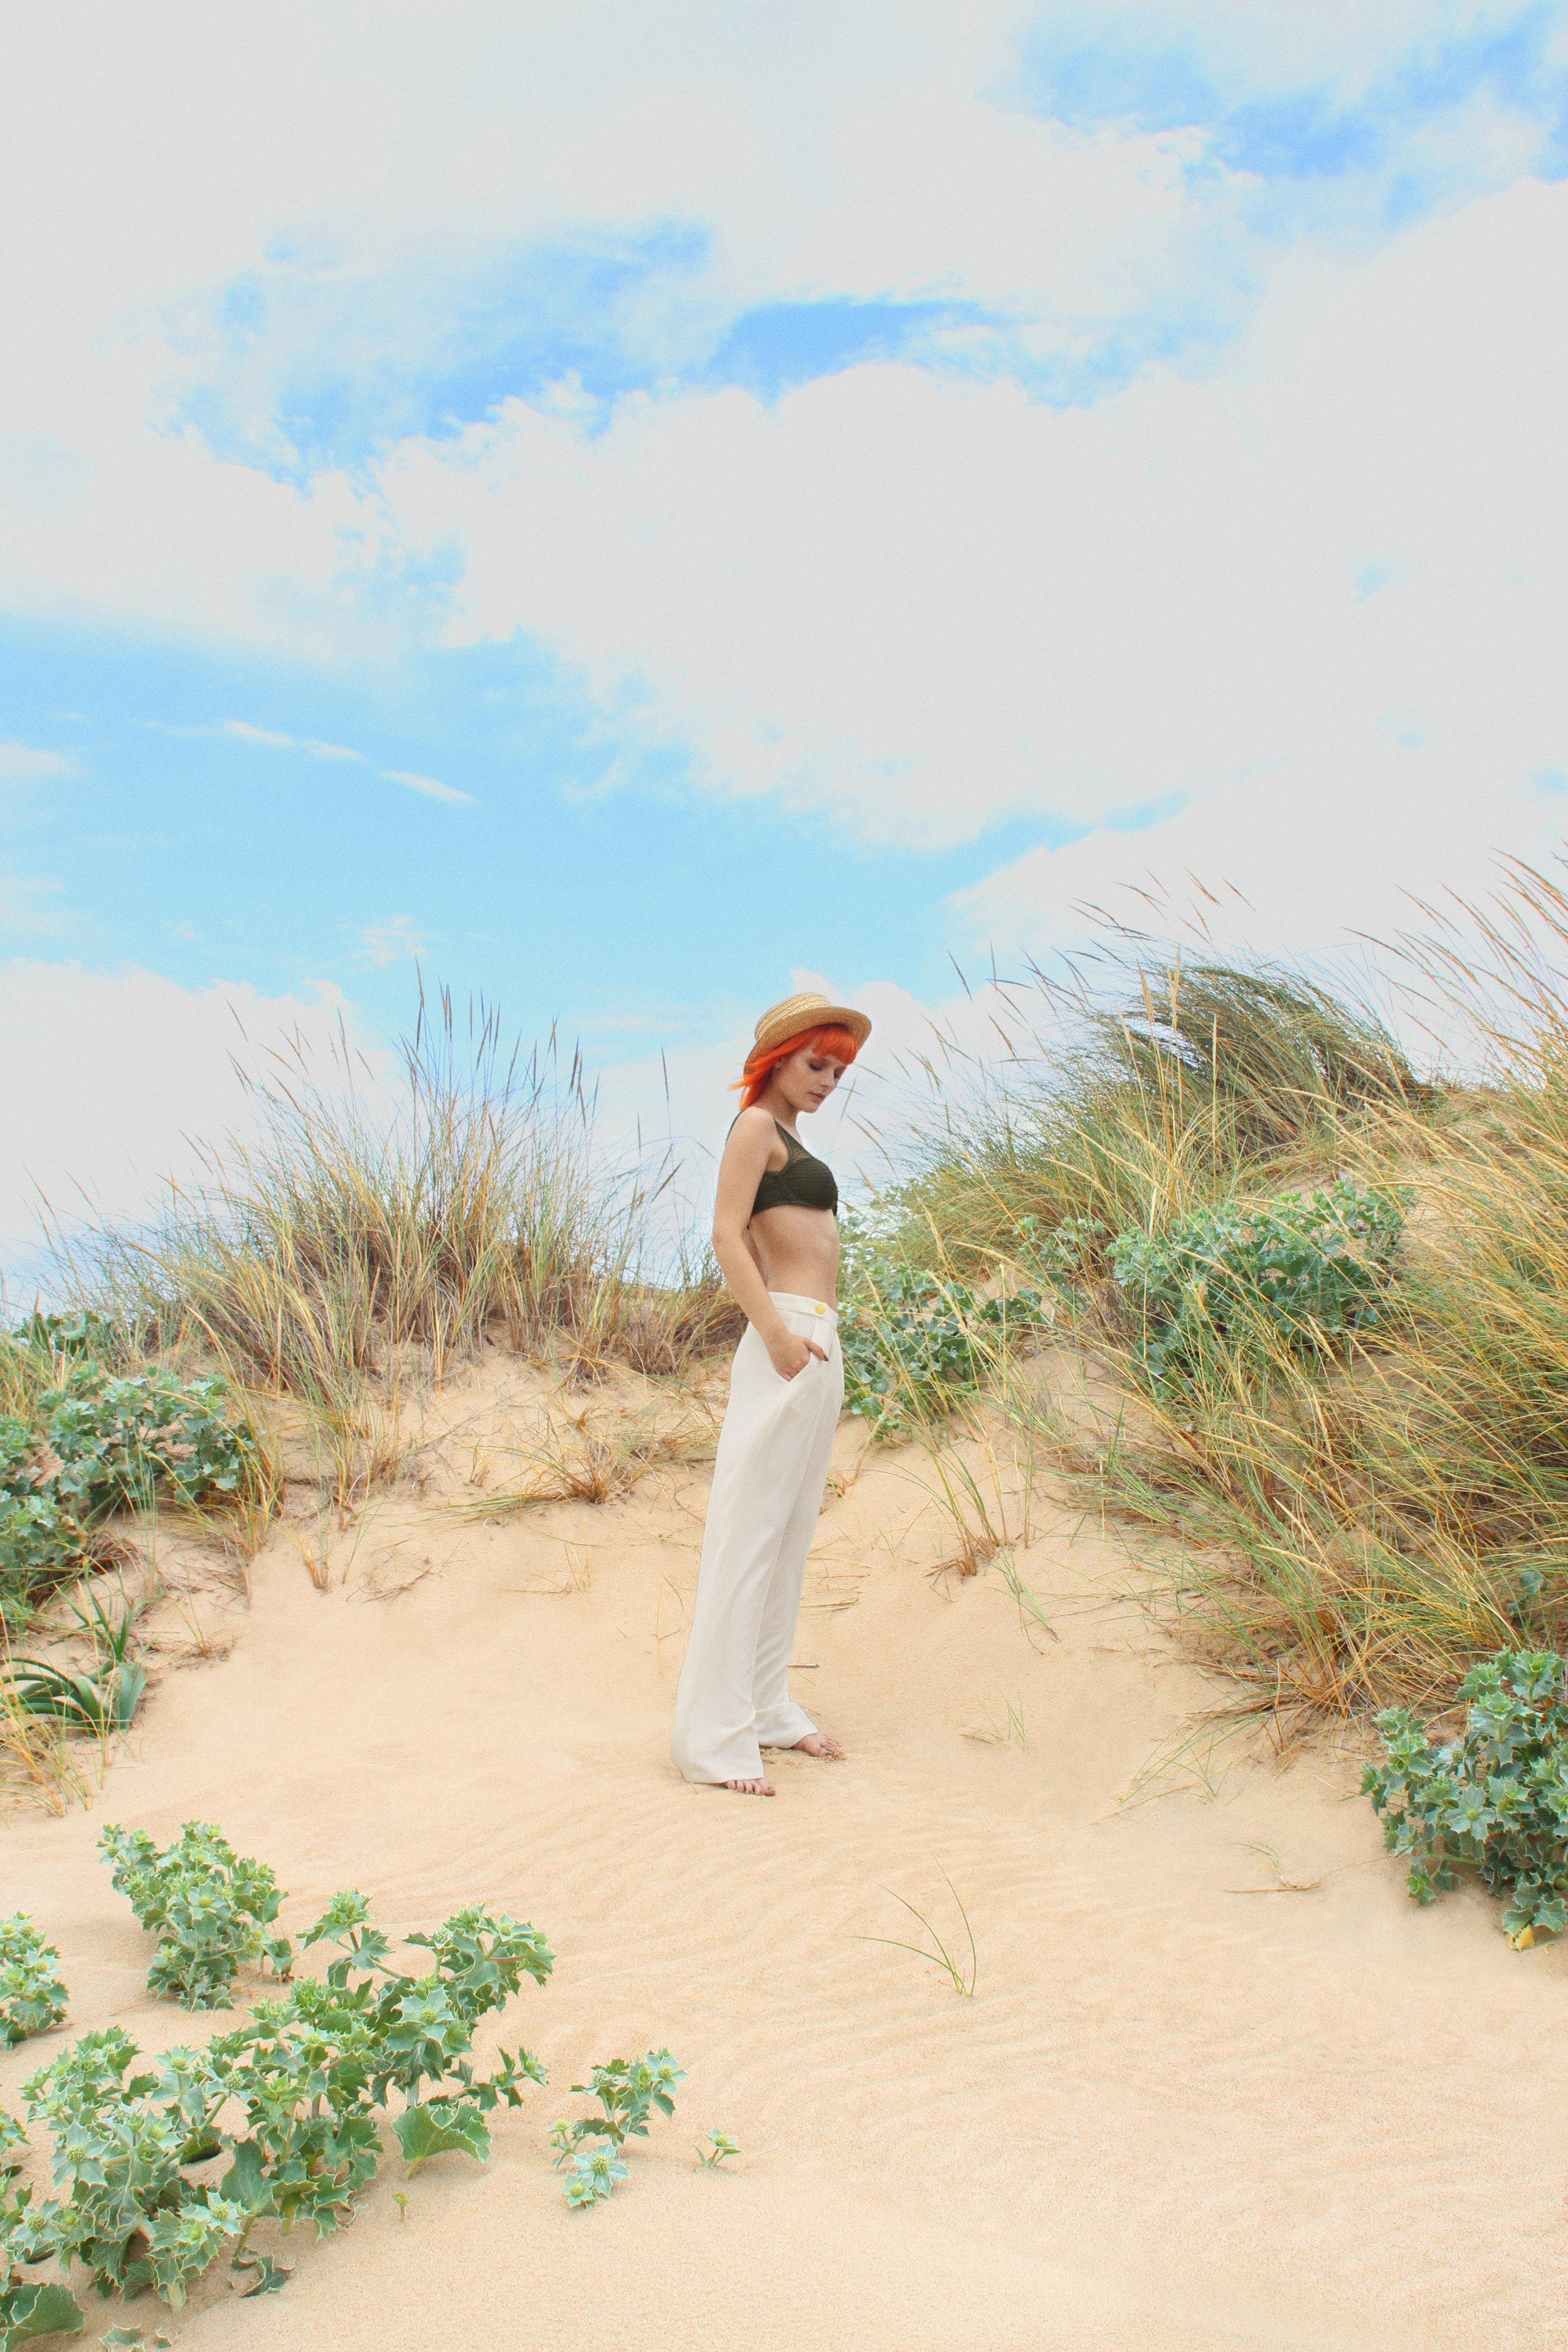 Bikini top Maria Martinez, Trousers Primark, Hat Stylit's Own